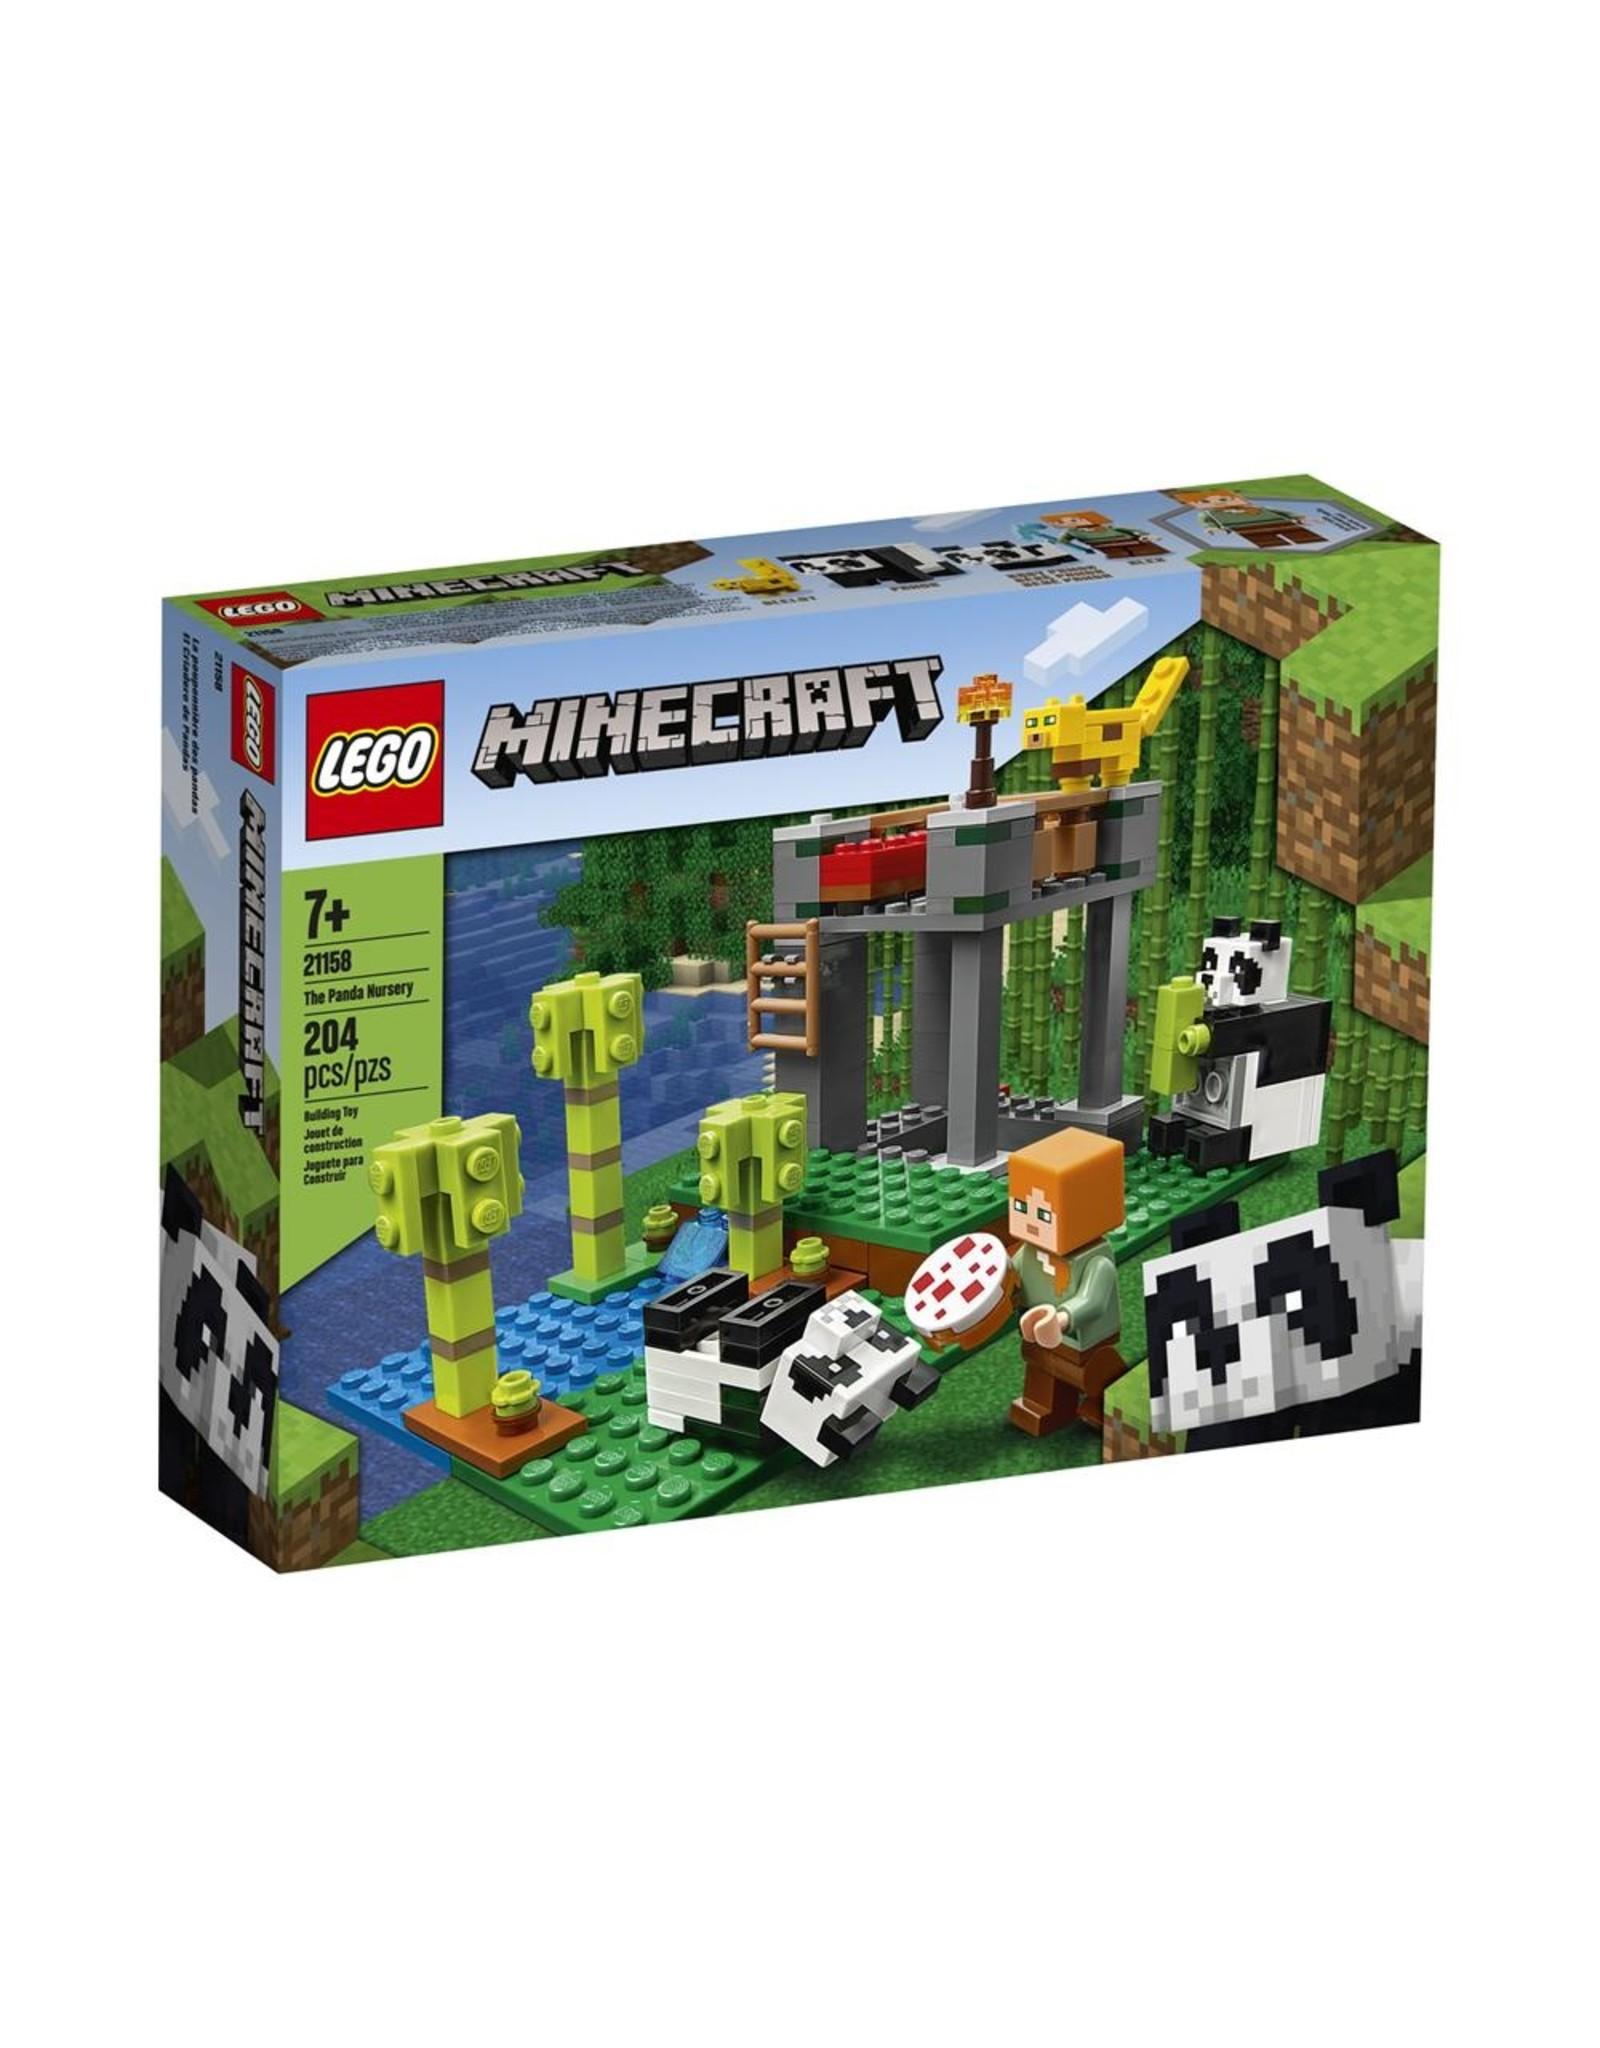 LEGO MINECRAFT 21158 THE PANDA NURSERY